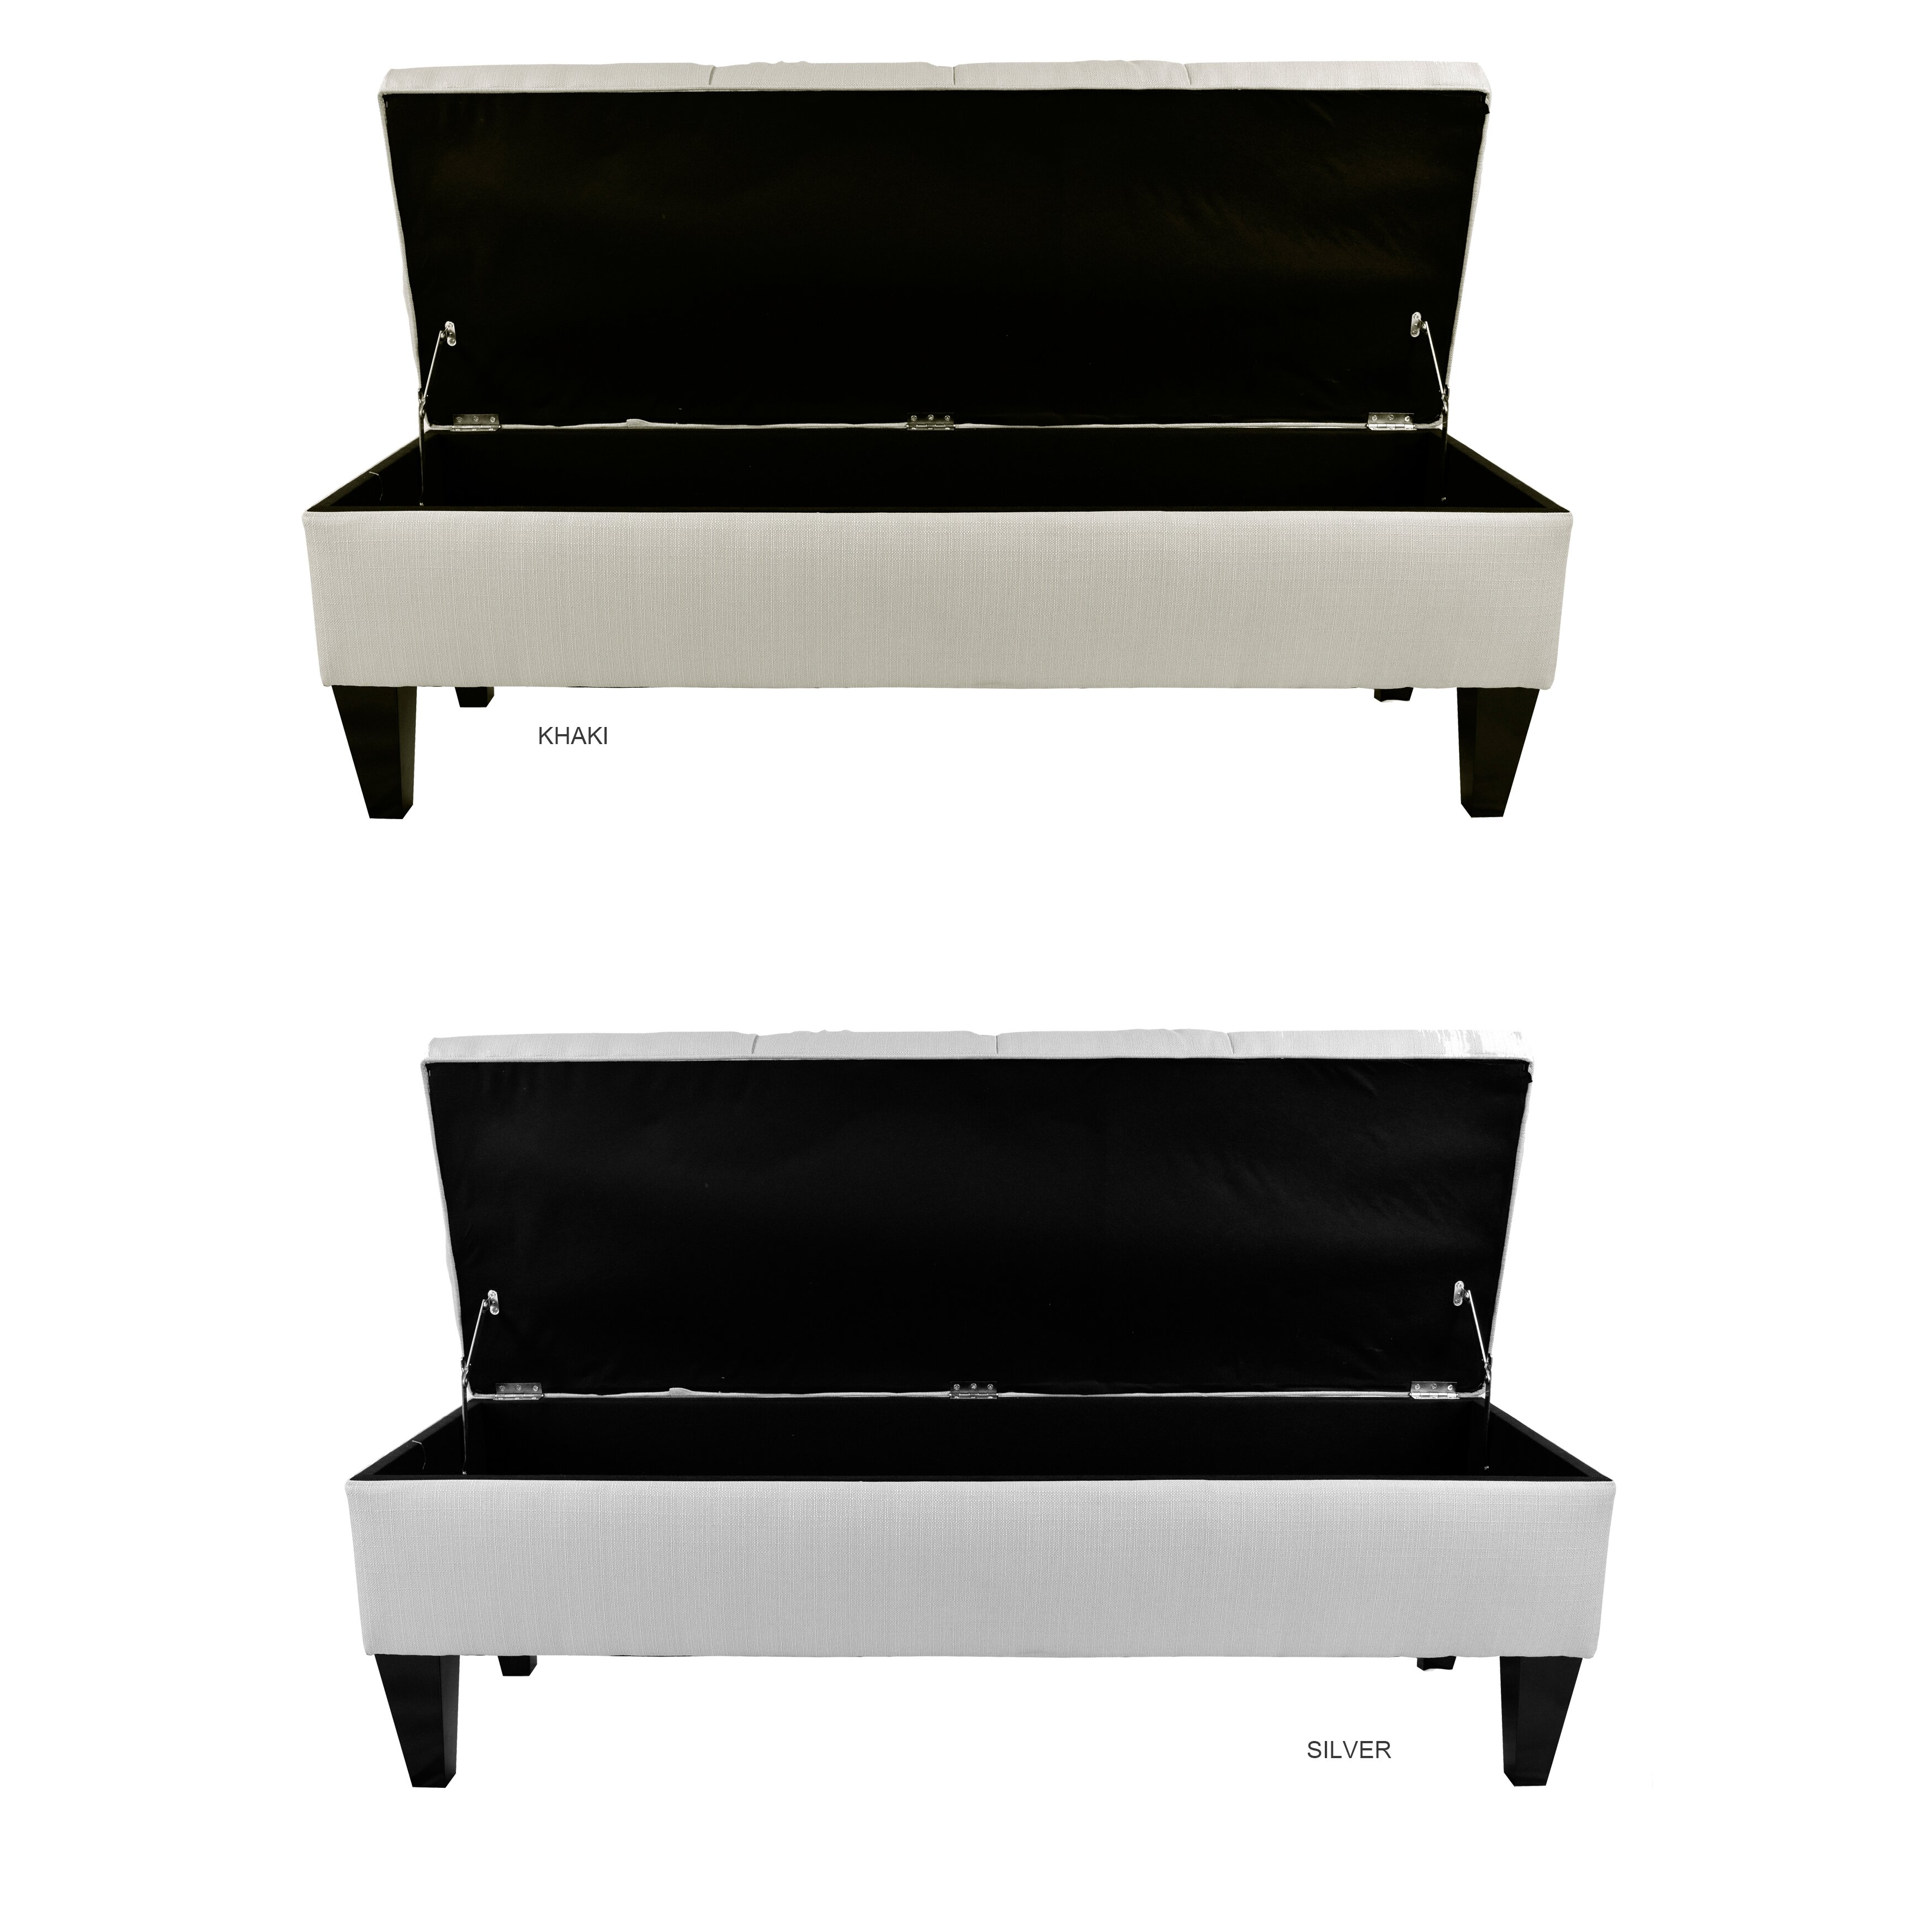 ... Bench moreover Long Upholstered Storage Bench. on sachi furniture wood